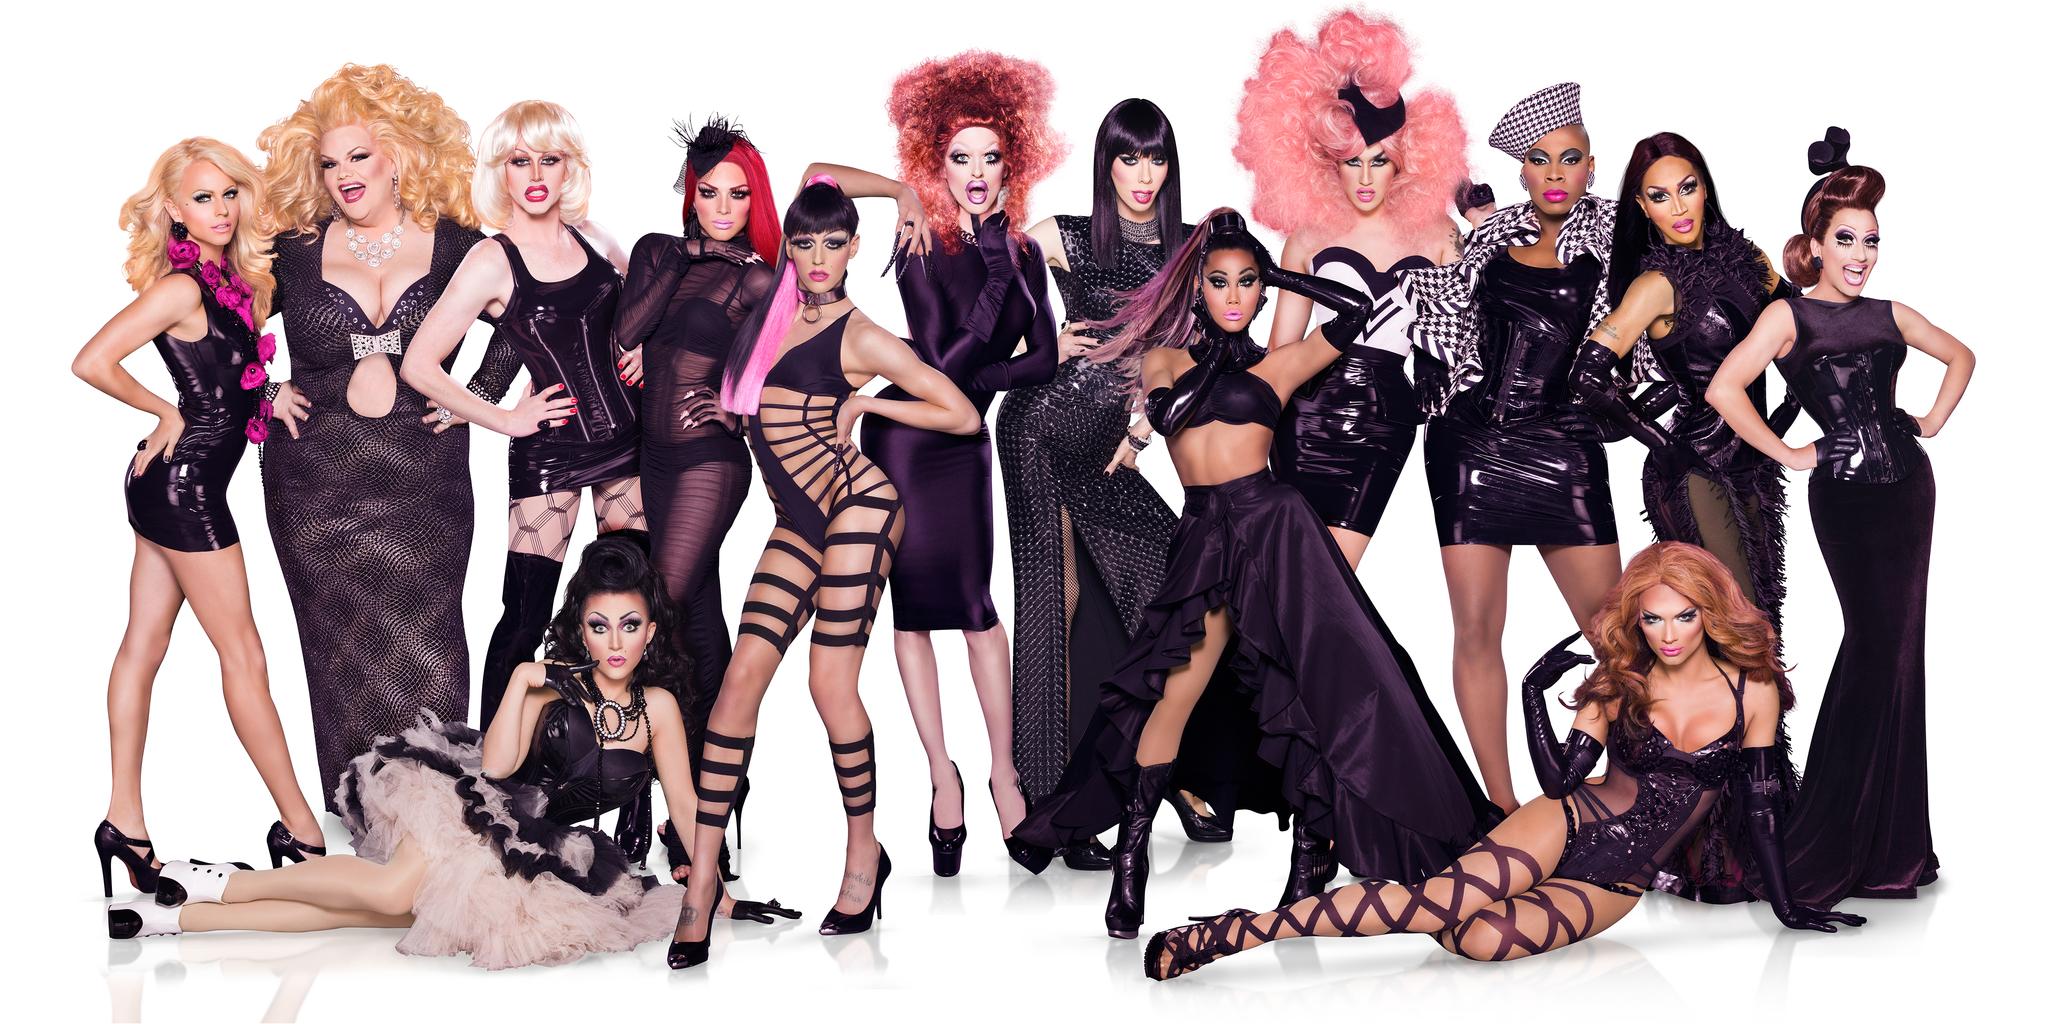 RuPaul\'s Drag Race (Season 6) | RuPaul\'s Drag Race Wiki | FANDOM ...